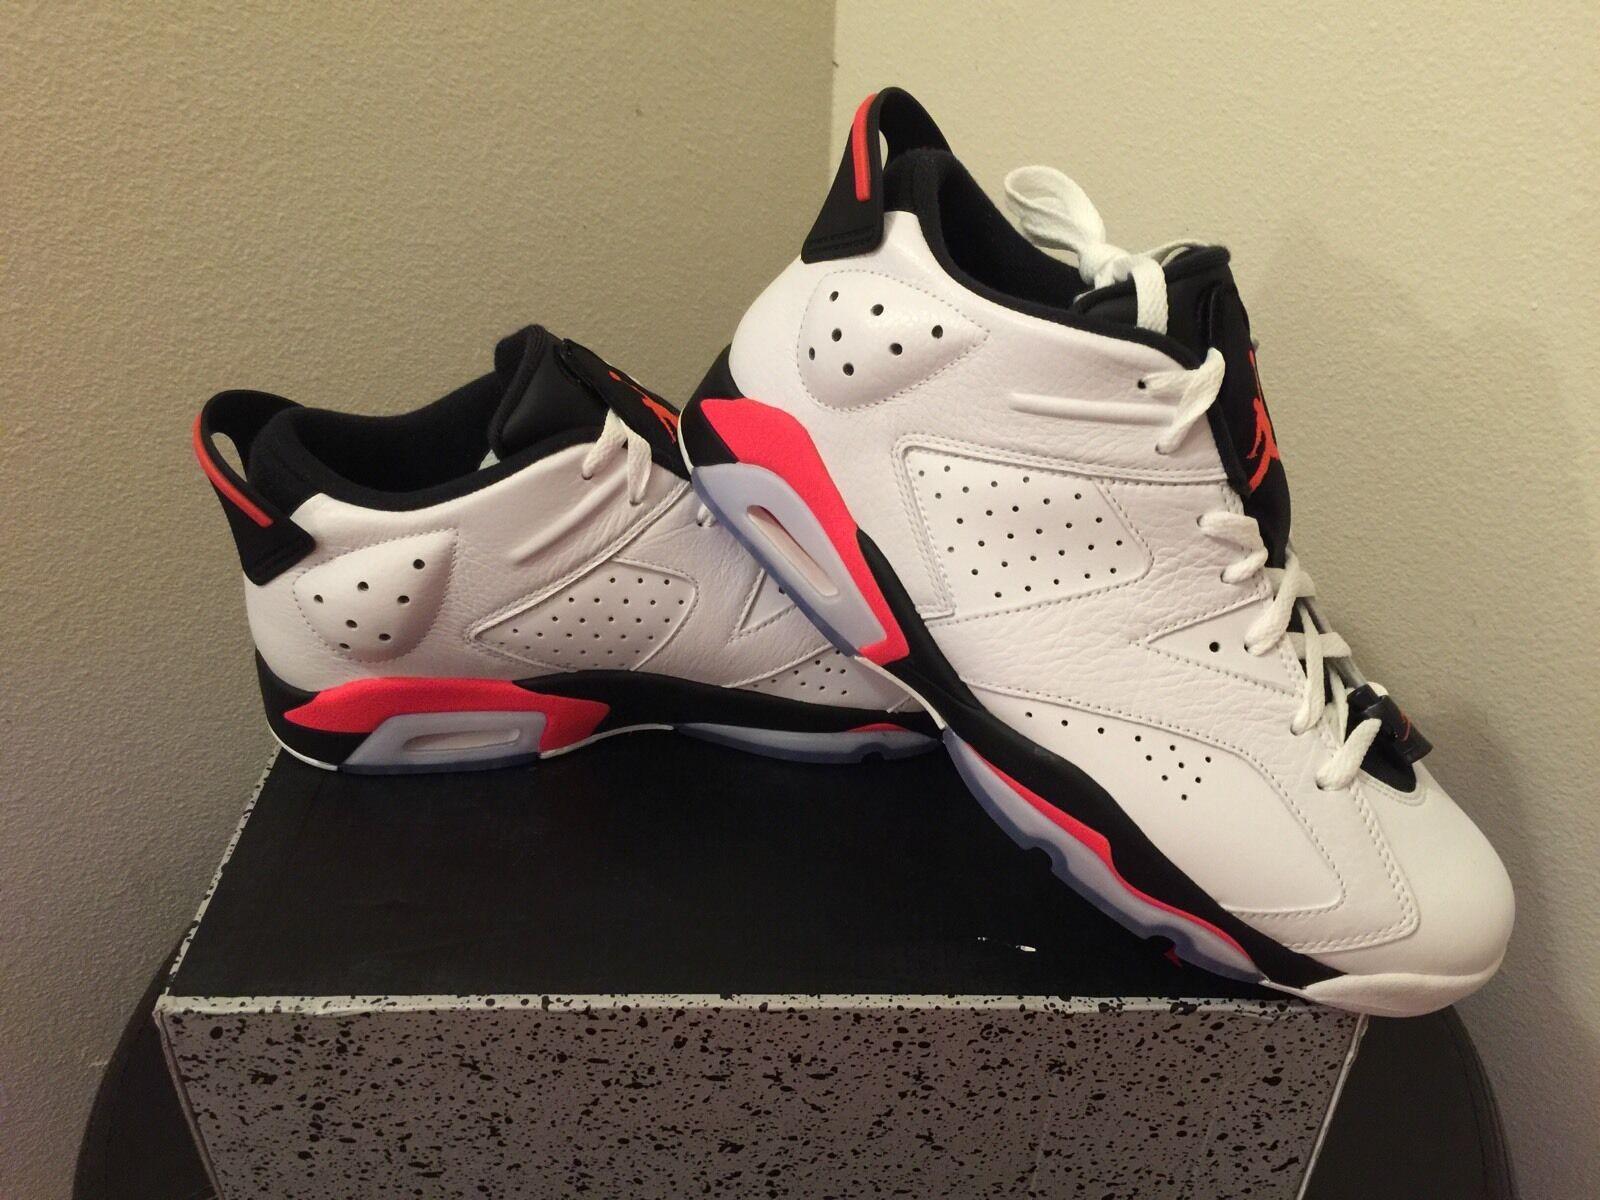 Nike Air Jordan 6 Retro Low Size 10.5 White  Infrared  23 Black [304401-123] DS